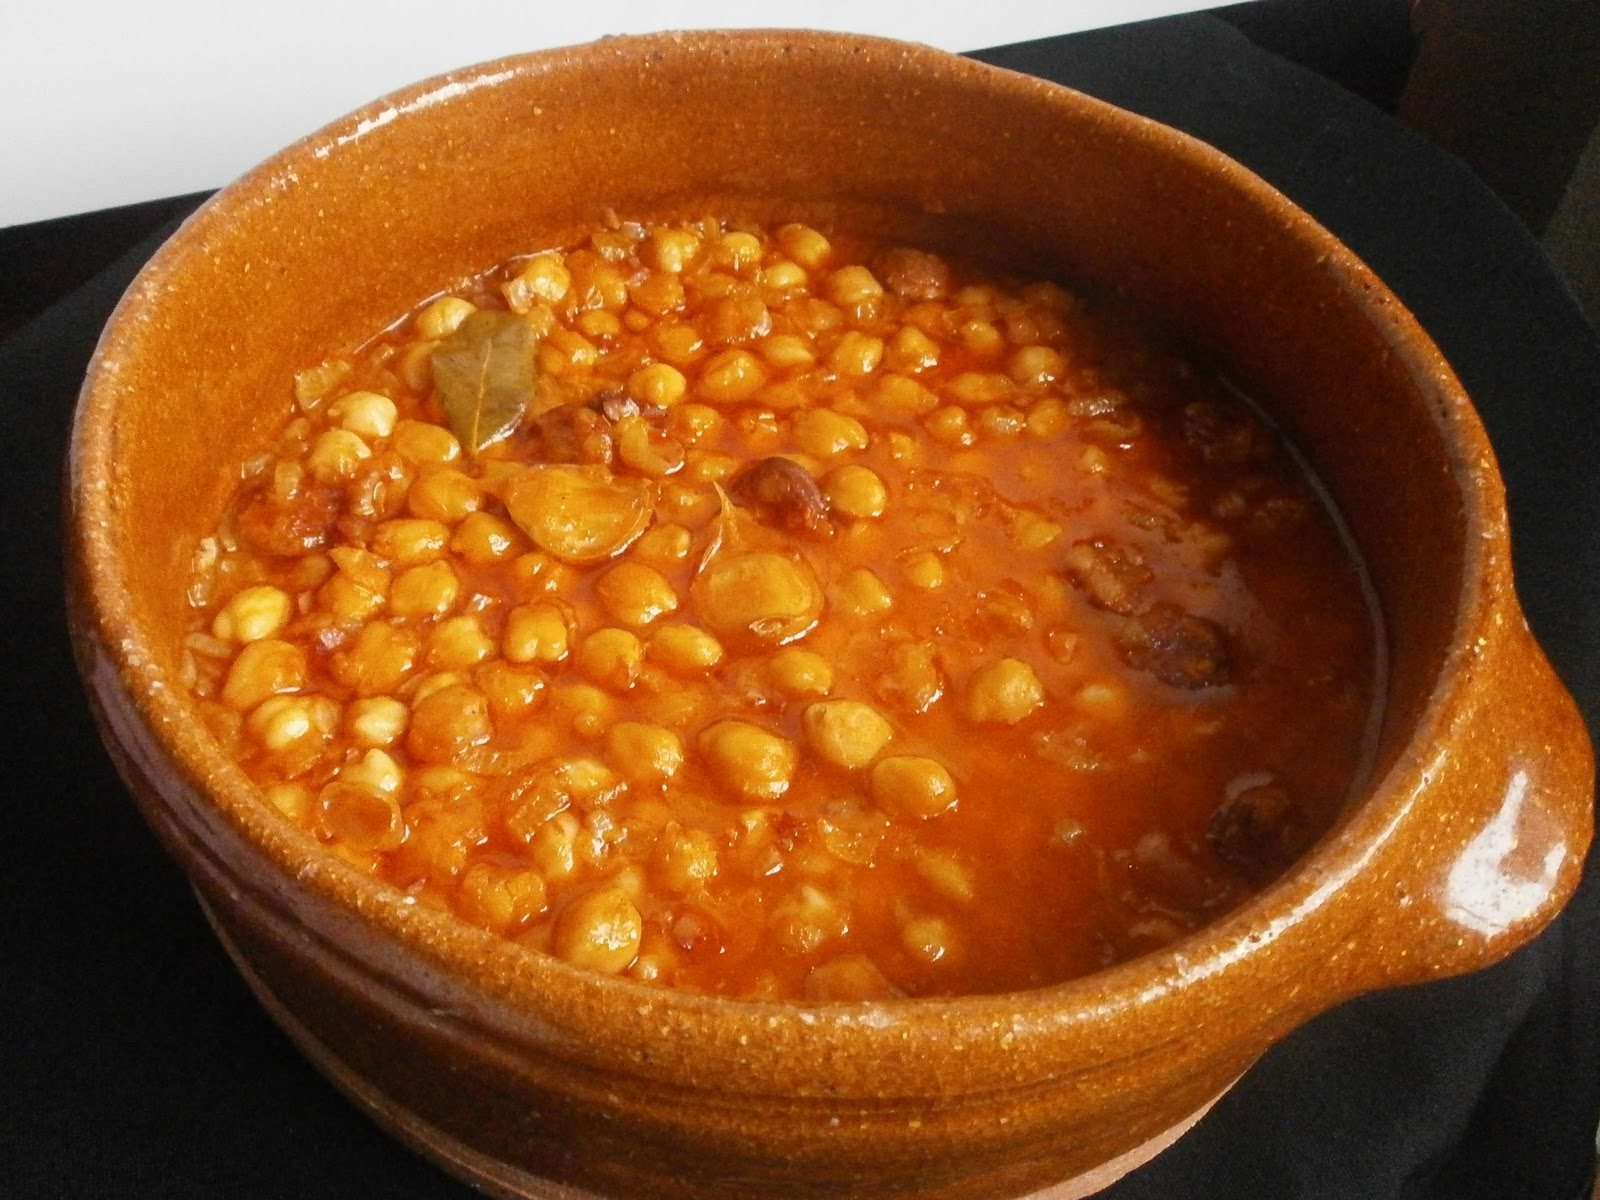 Tximitxurri garbanzos con chorizo y jamon for Cocinar garbanzos con chorizo